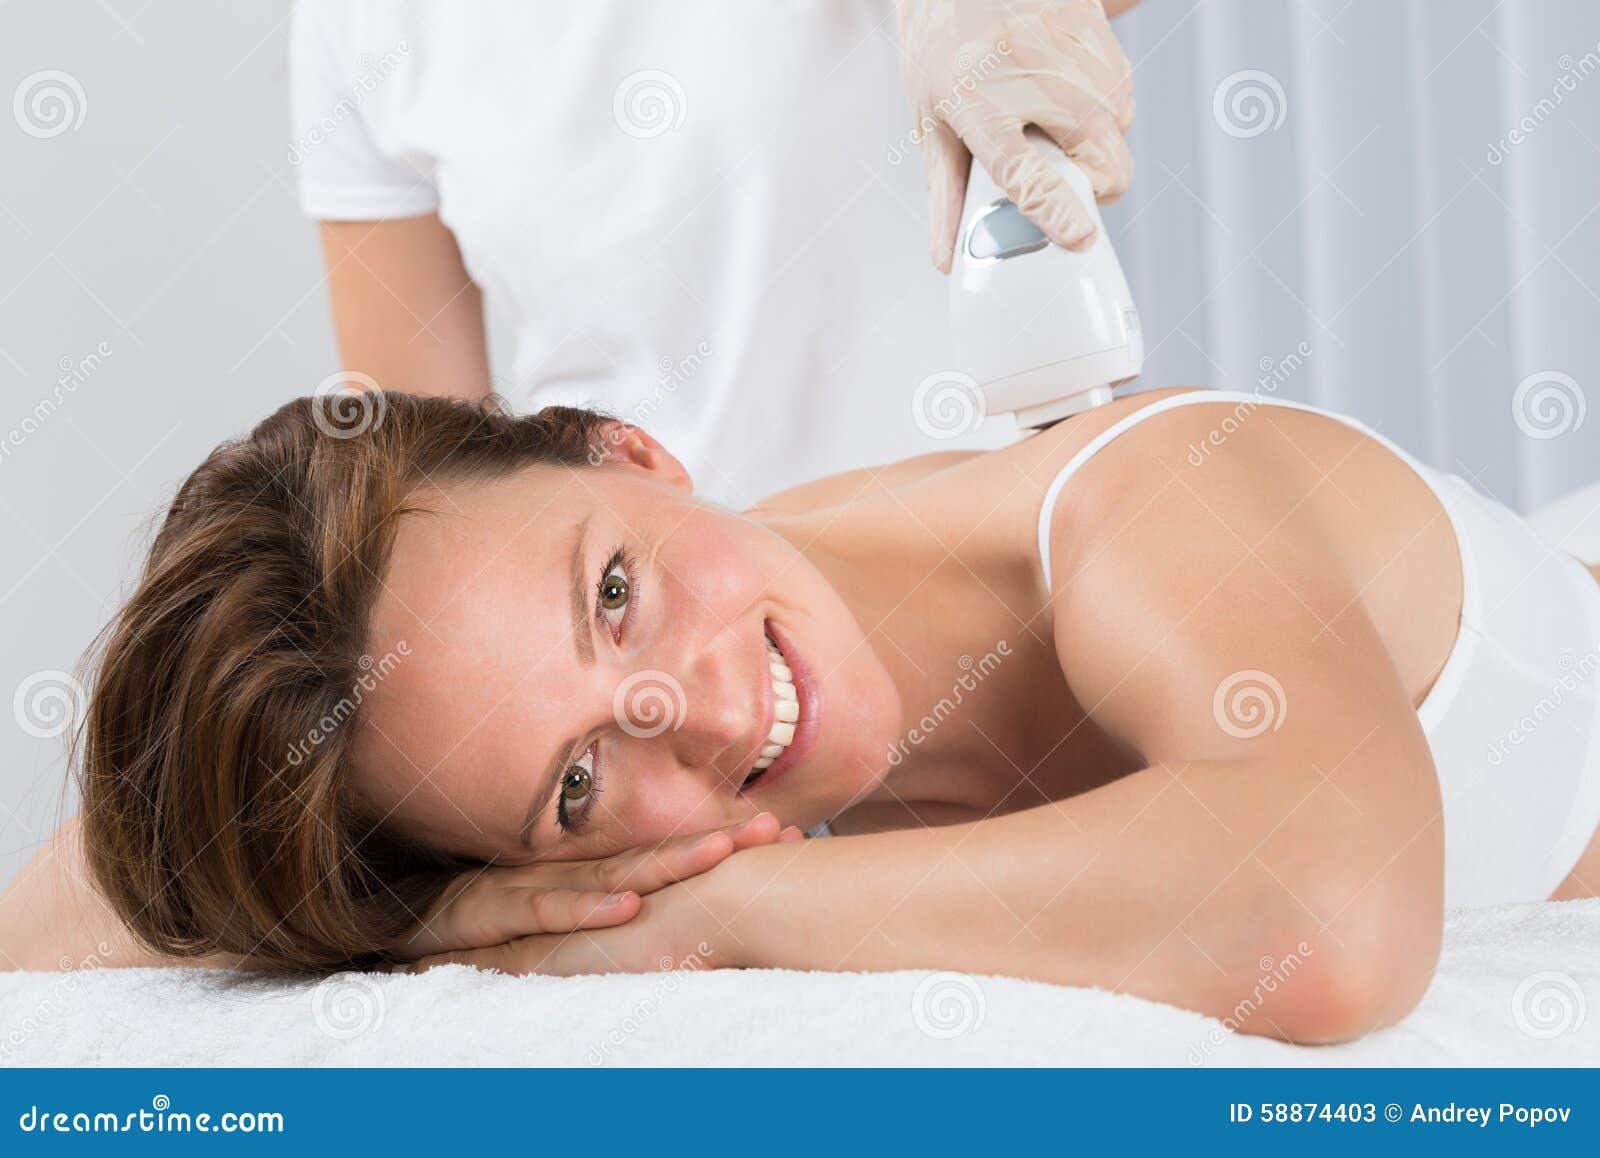 woman getting epilation laser treatment stock photo image 58874403. Black Bedroom Furniture Sets. Home Design Ideas